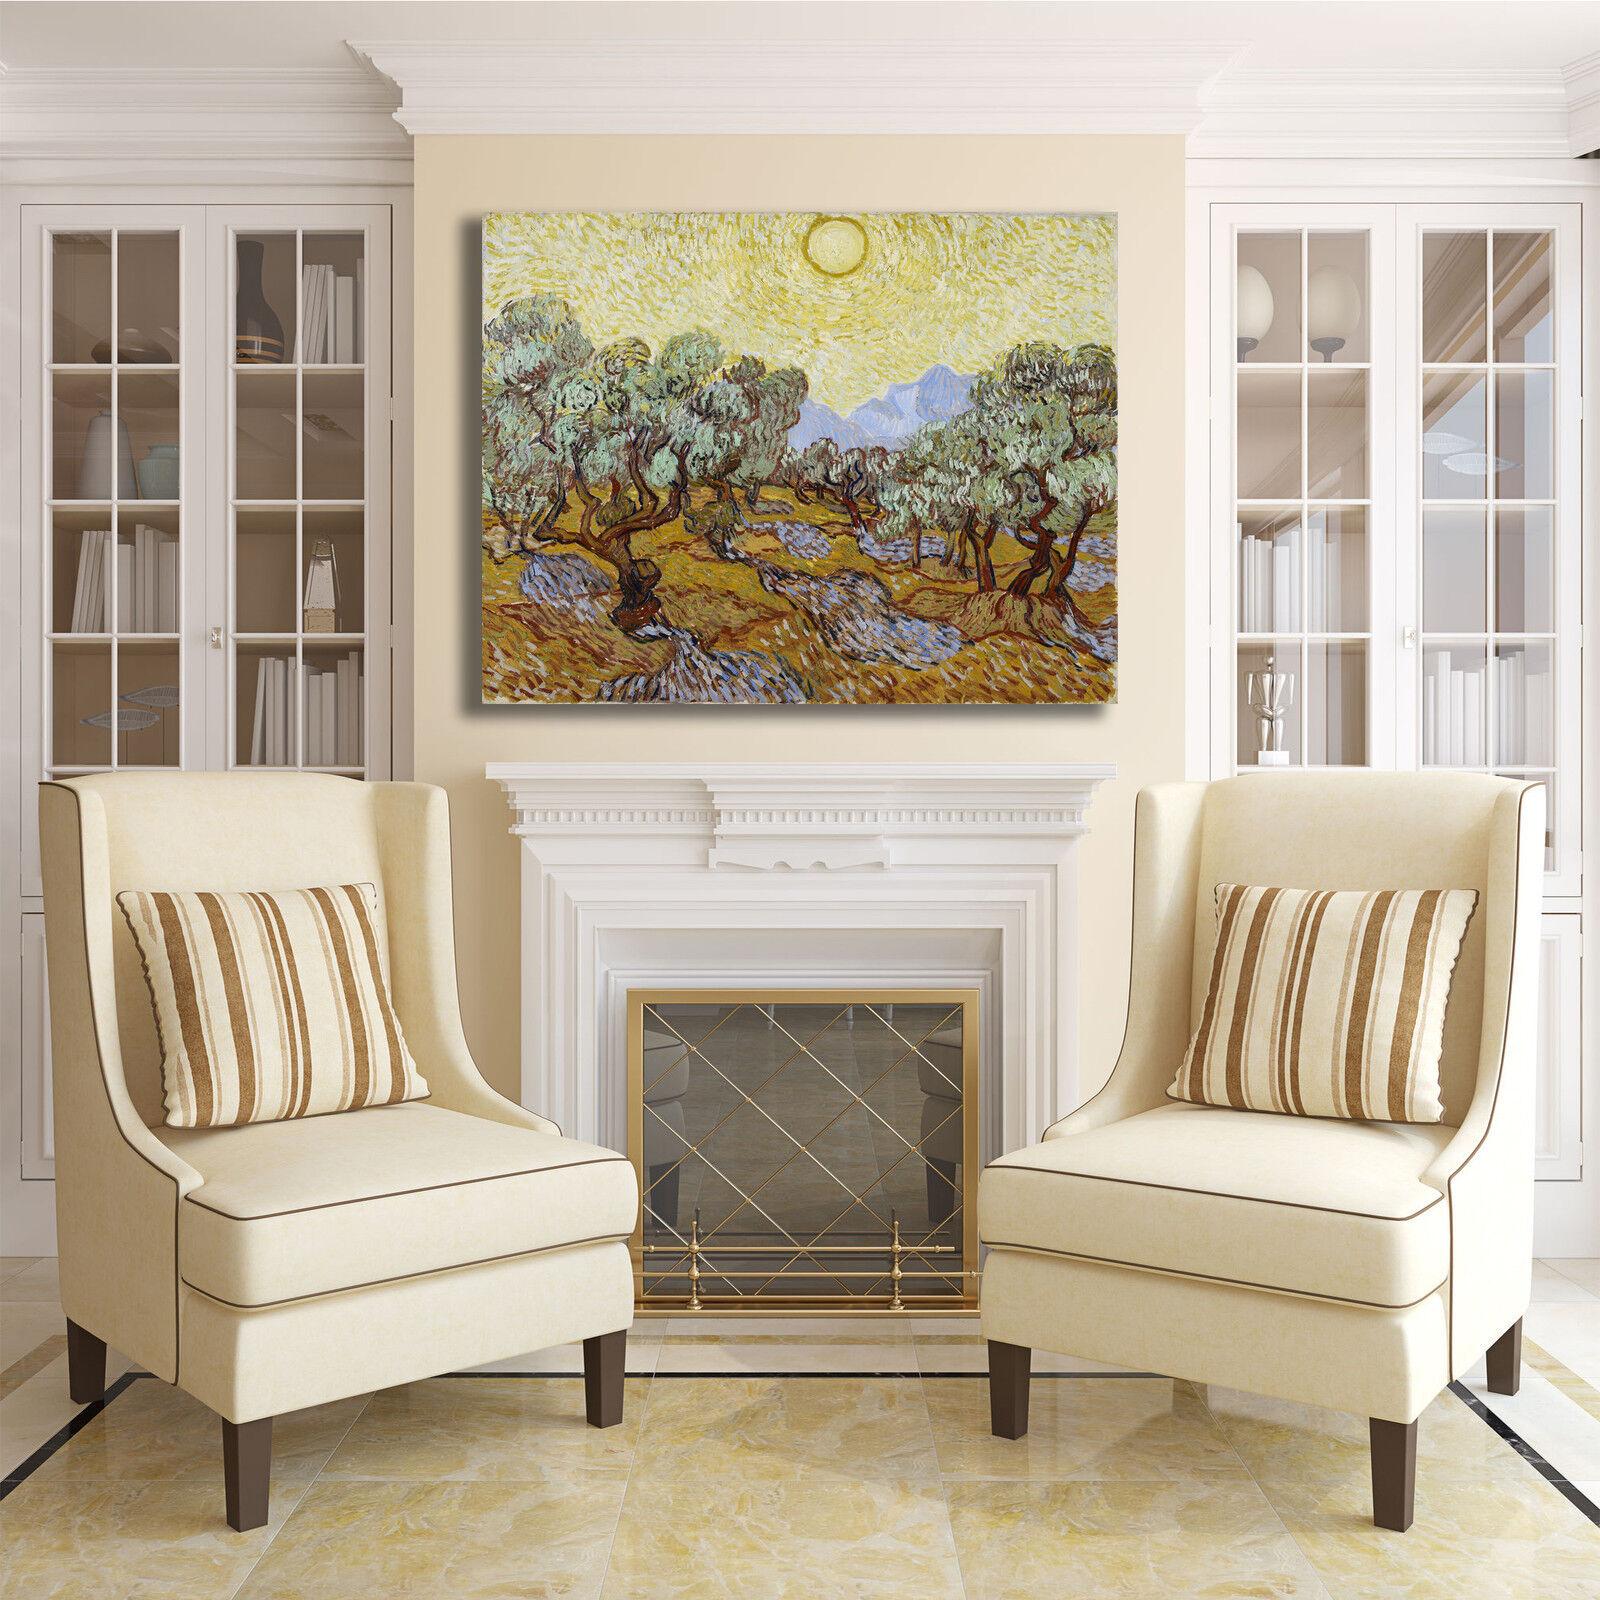 Van Gogh alberi di olive design quadro stampa tela tela stampa dipinto telaio arRouge o casa 83067c